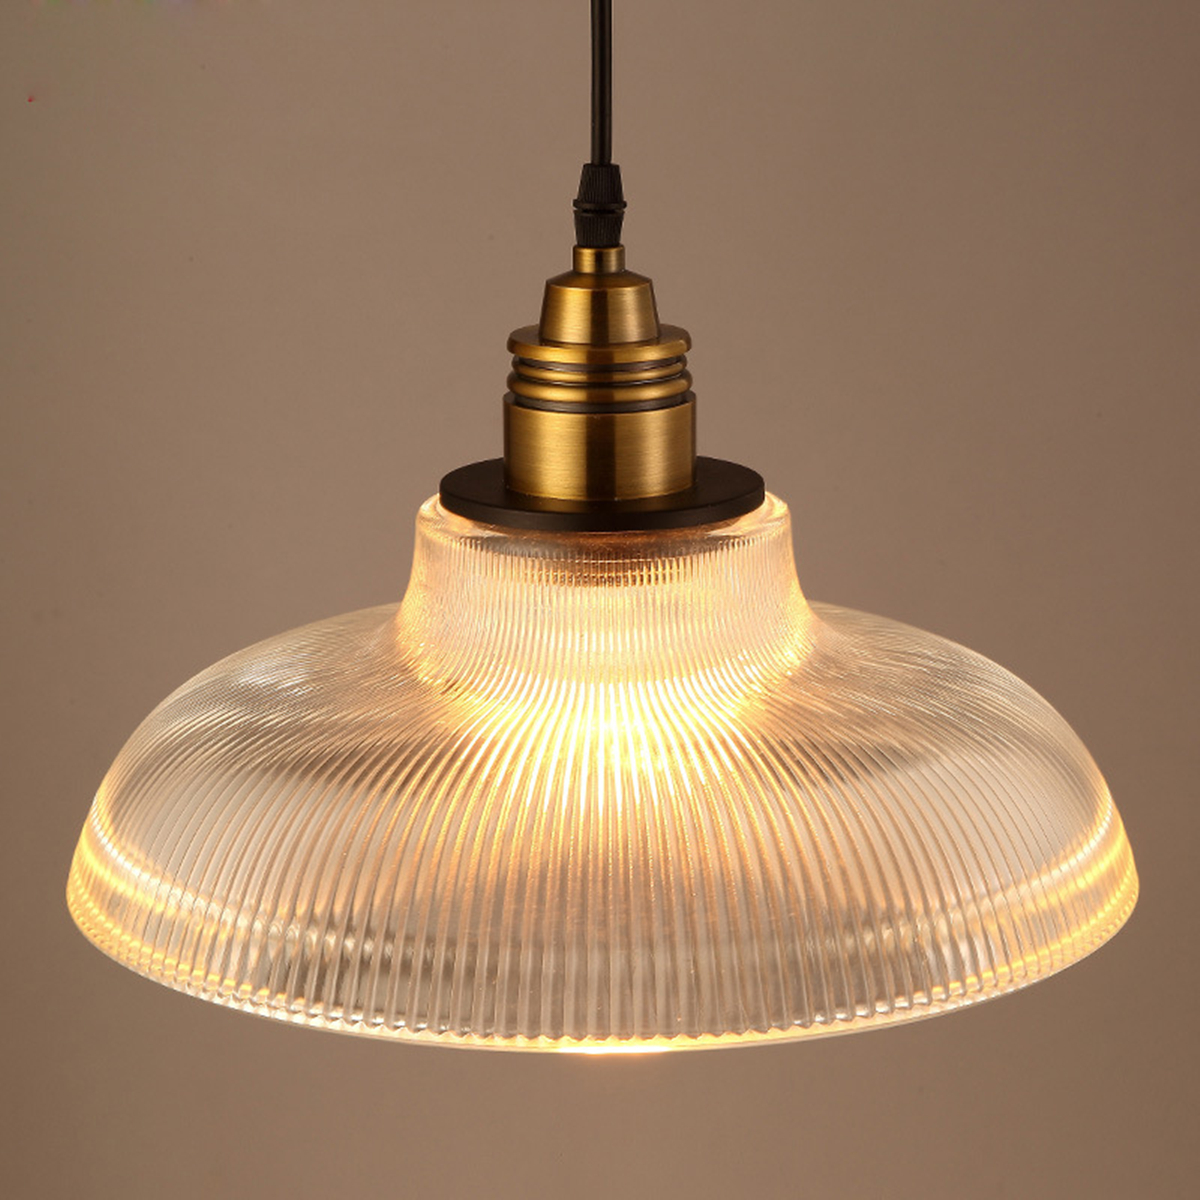 Antique Industrial Glass Pendant Ceiling Light Vintage